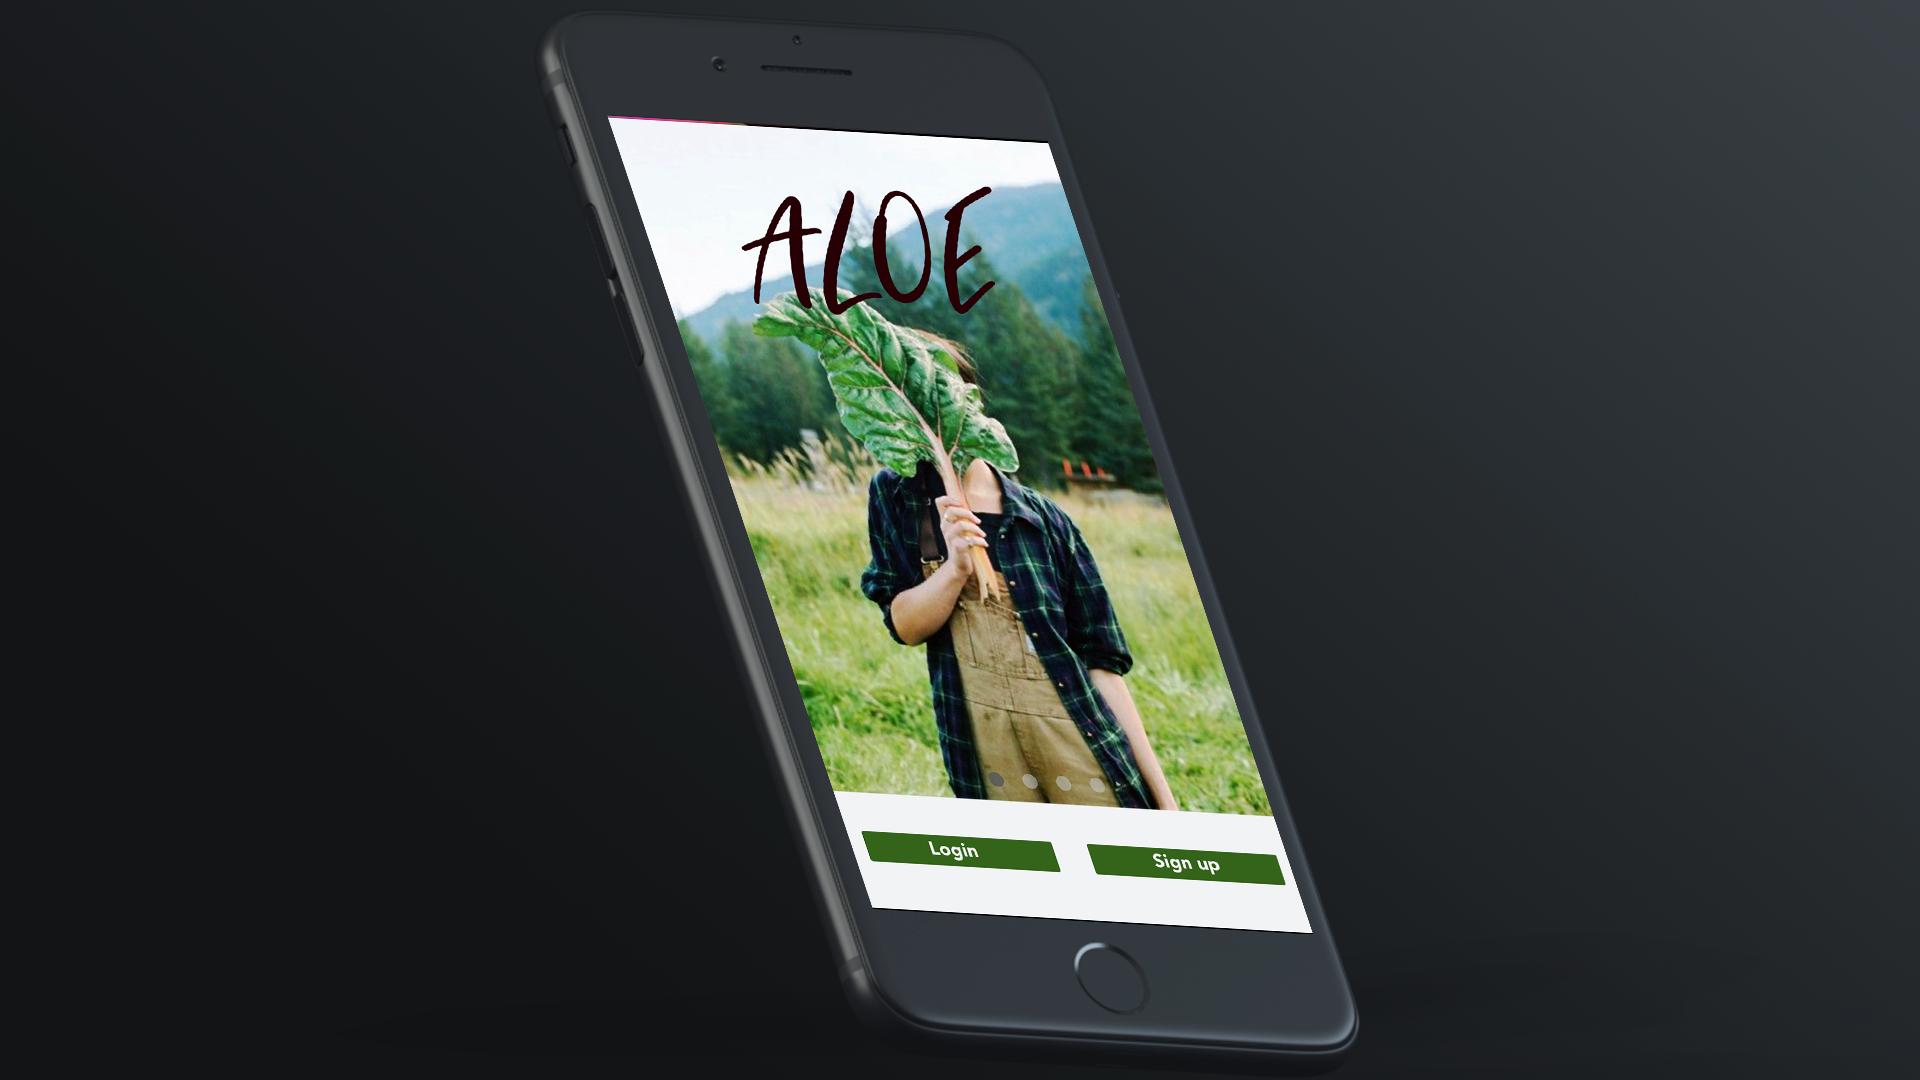 Aloe_iPhone_V1.png